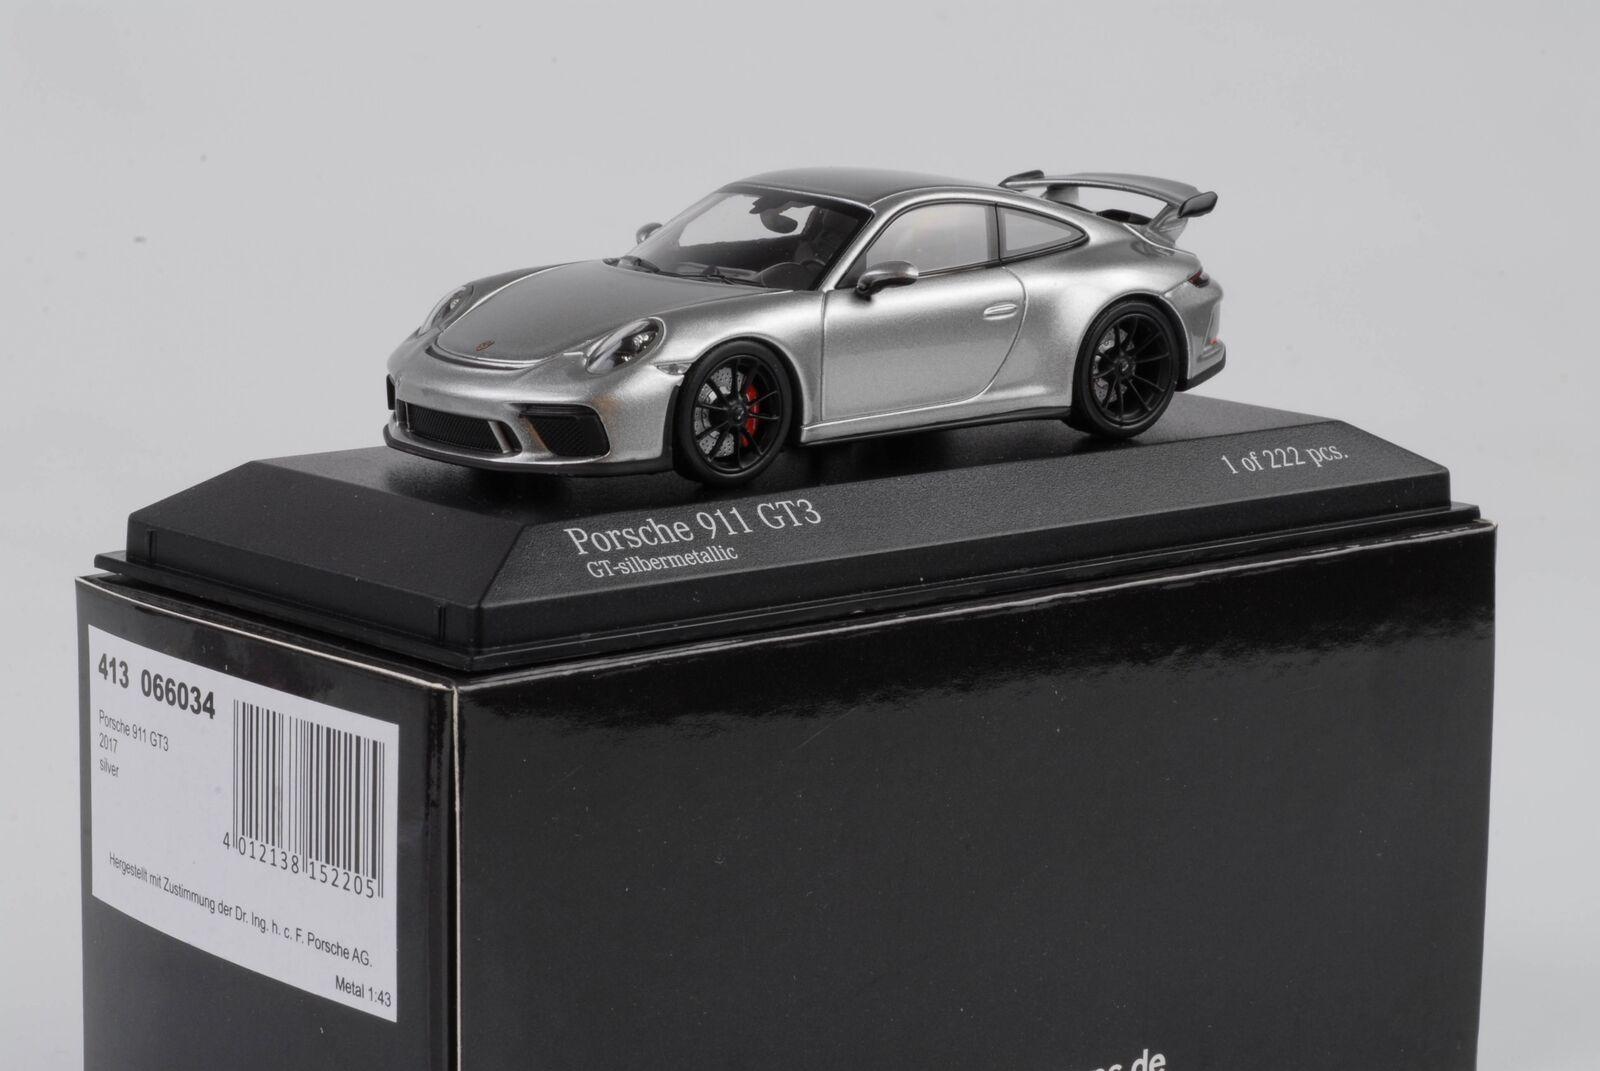 Porsche 911 991 Gt3 2017 Gt-argentometallic nero Llantas grigio 1 43 Minichamps